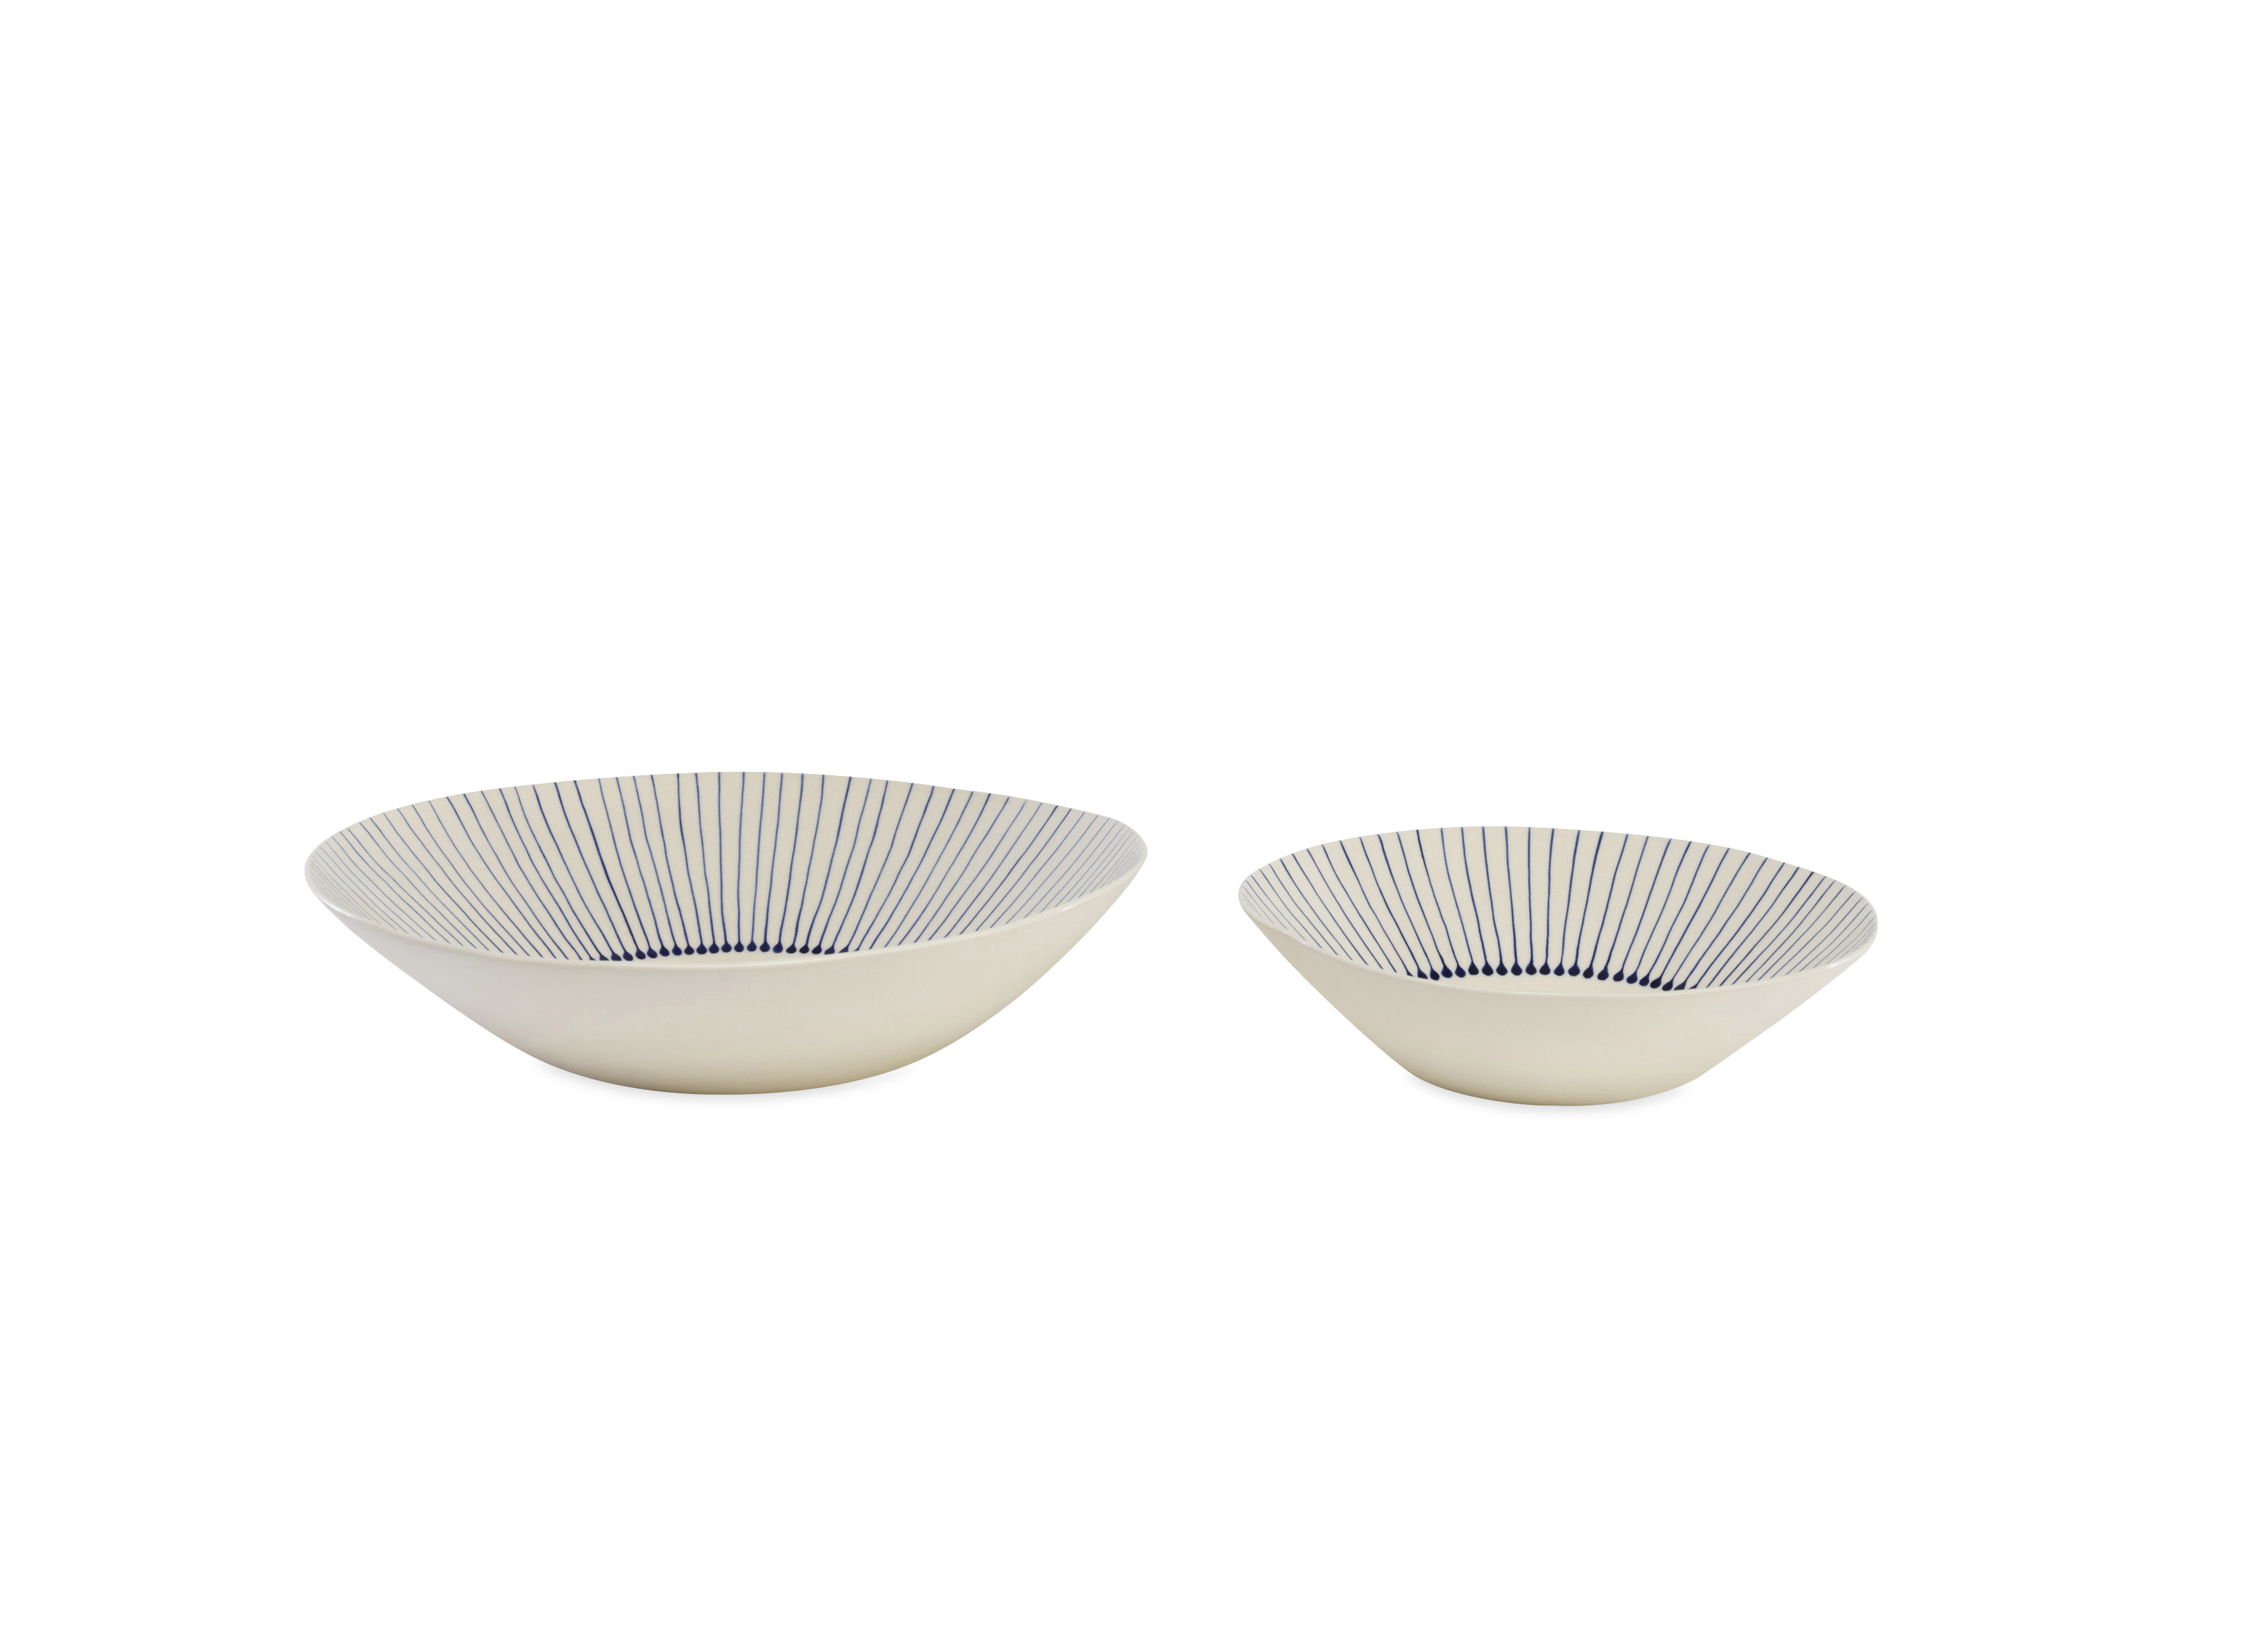 nkuku bowls